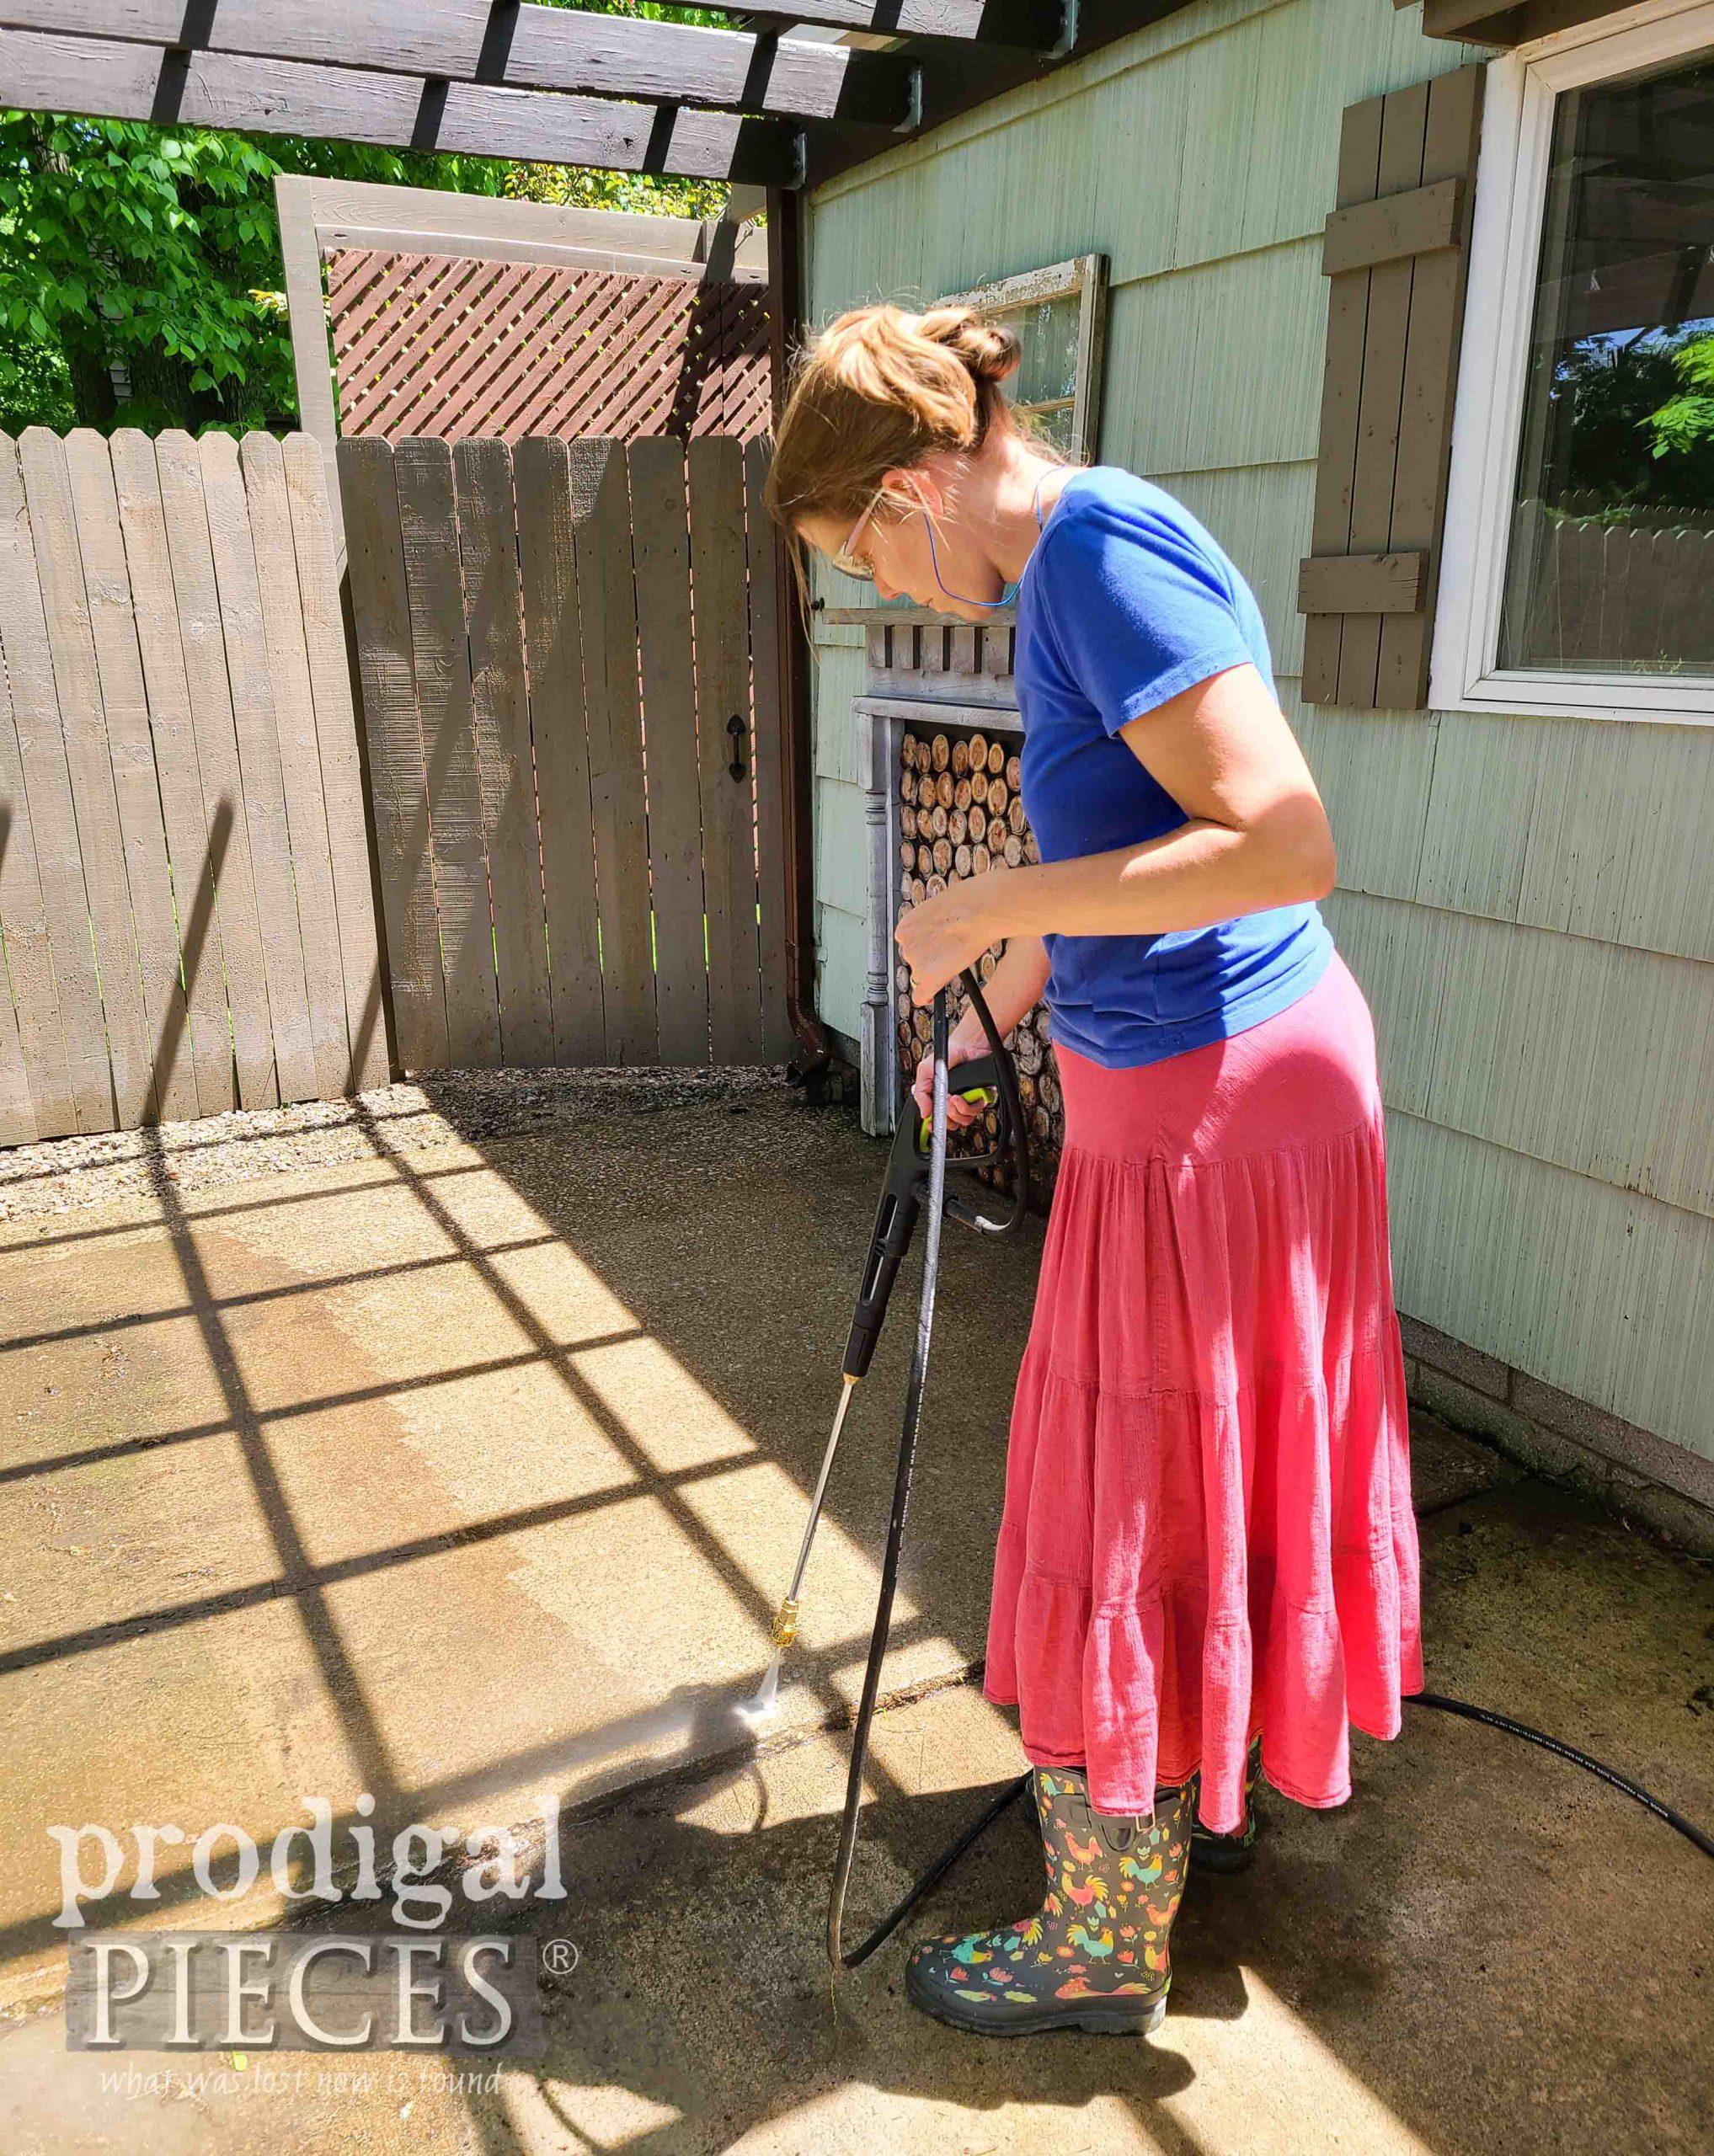 Pressure-Washing Patio | prodigalpieces.com